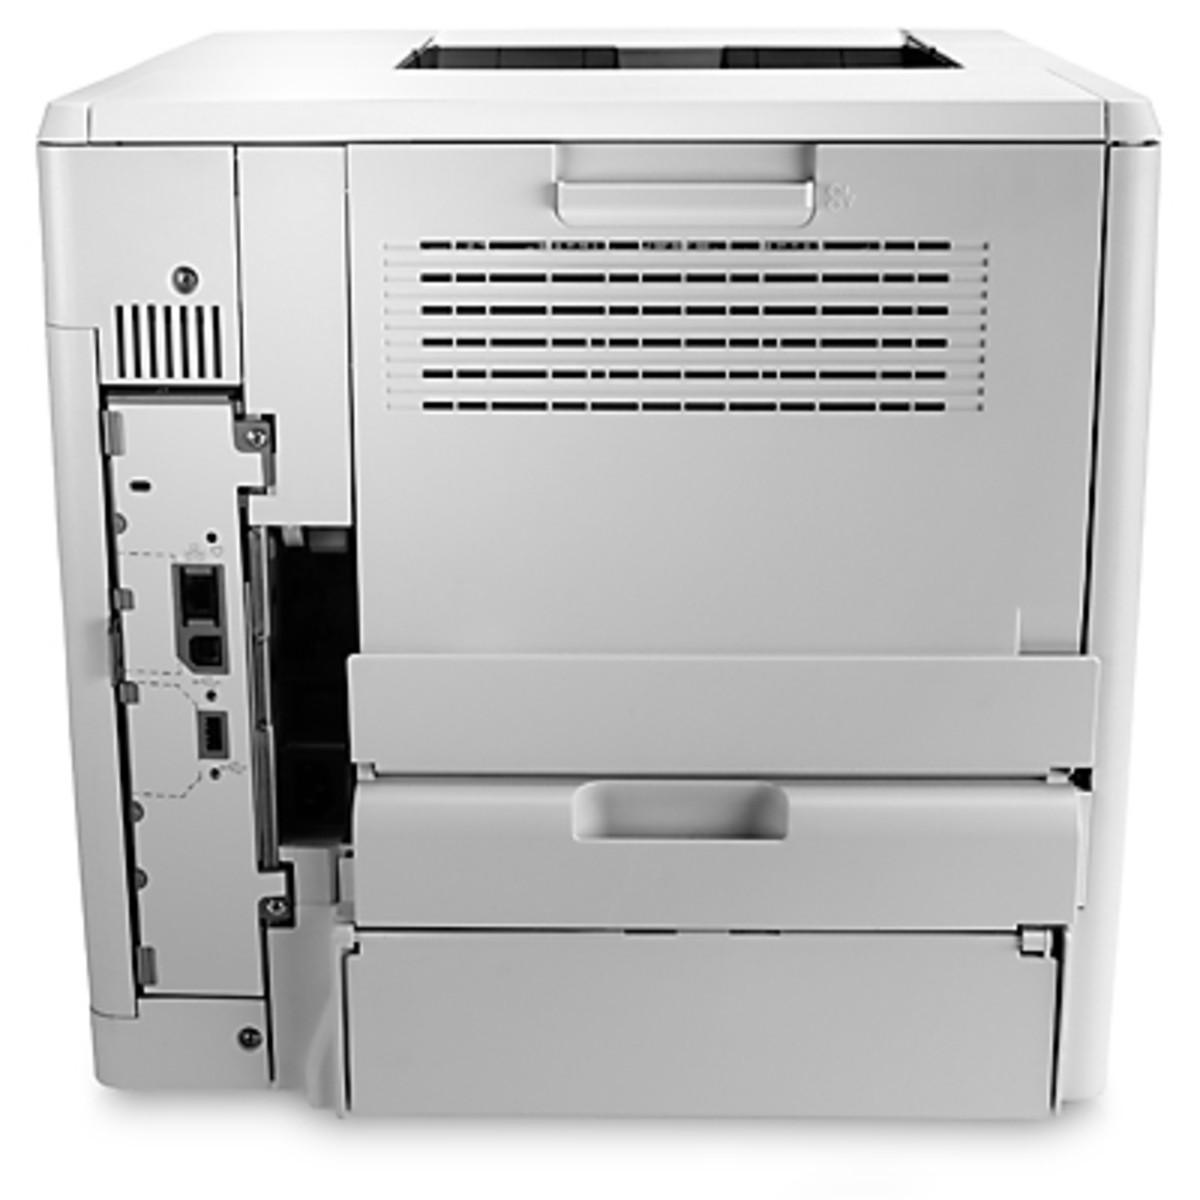 HP LaserJet Pro M605n Printer